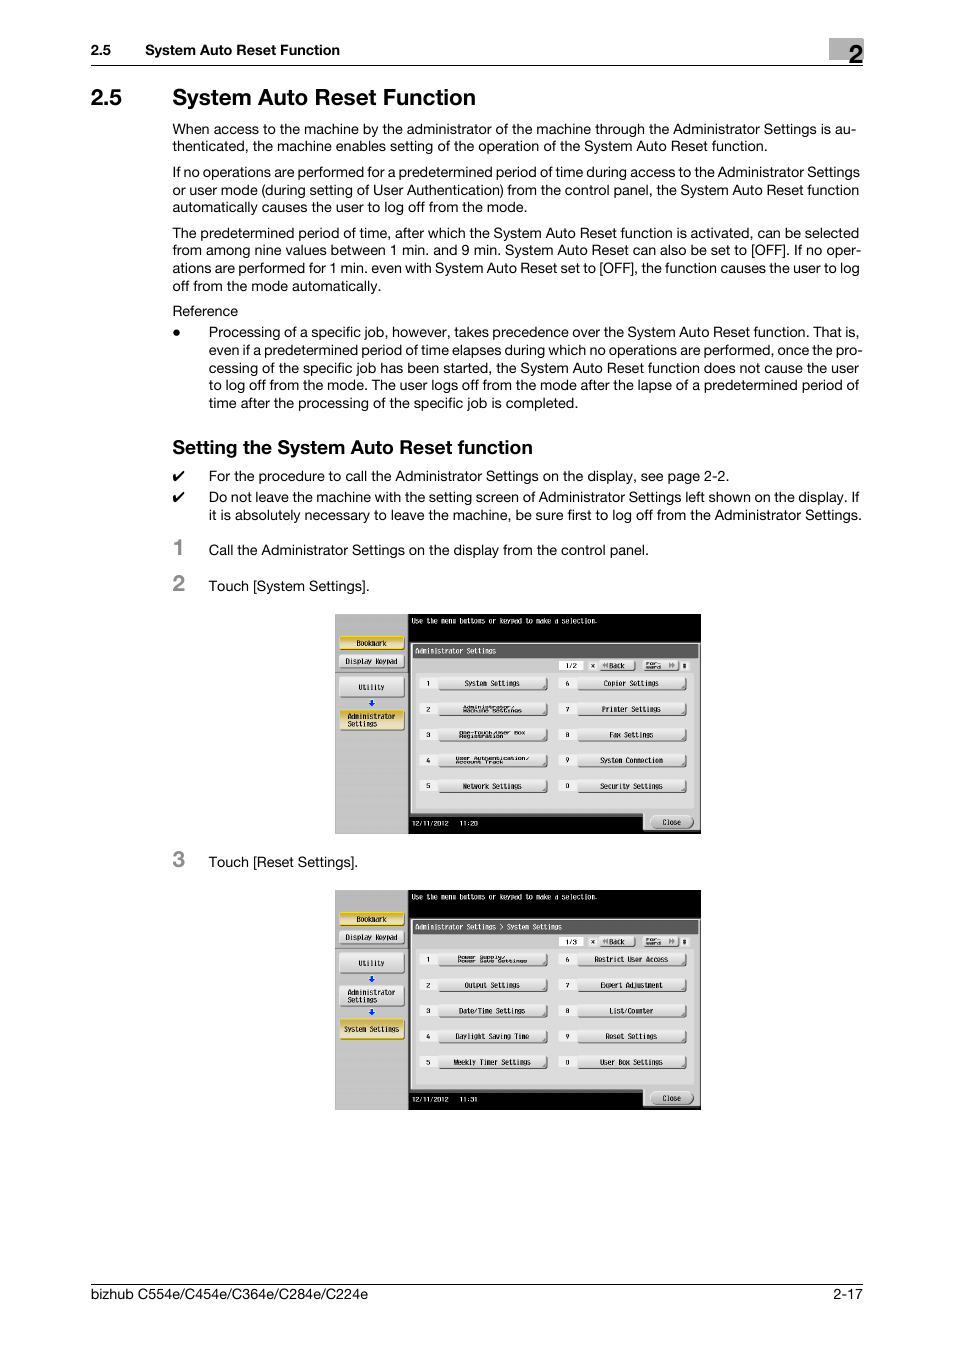 5 system auto reset function, Setting the system auto reset function | Konica  Minolta bizhub